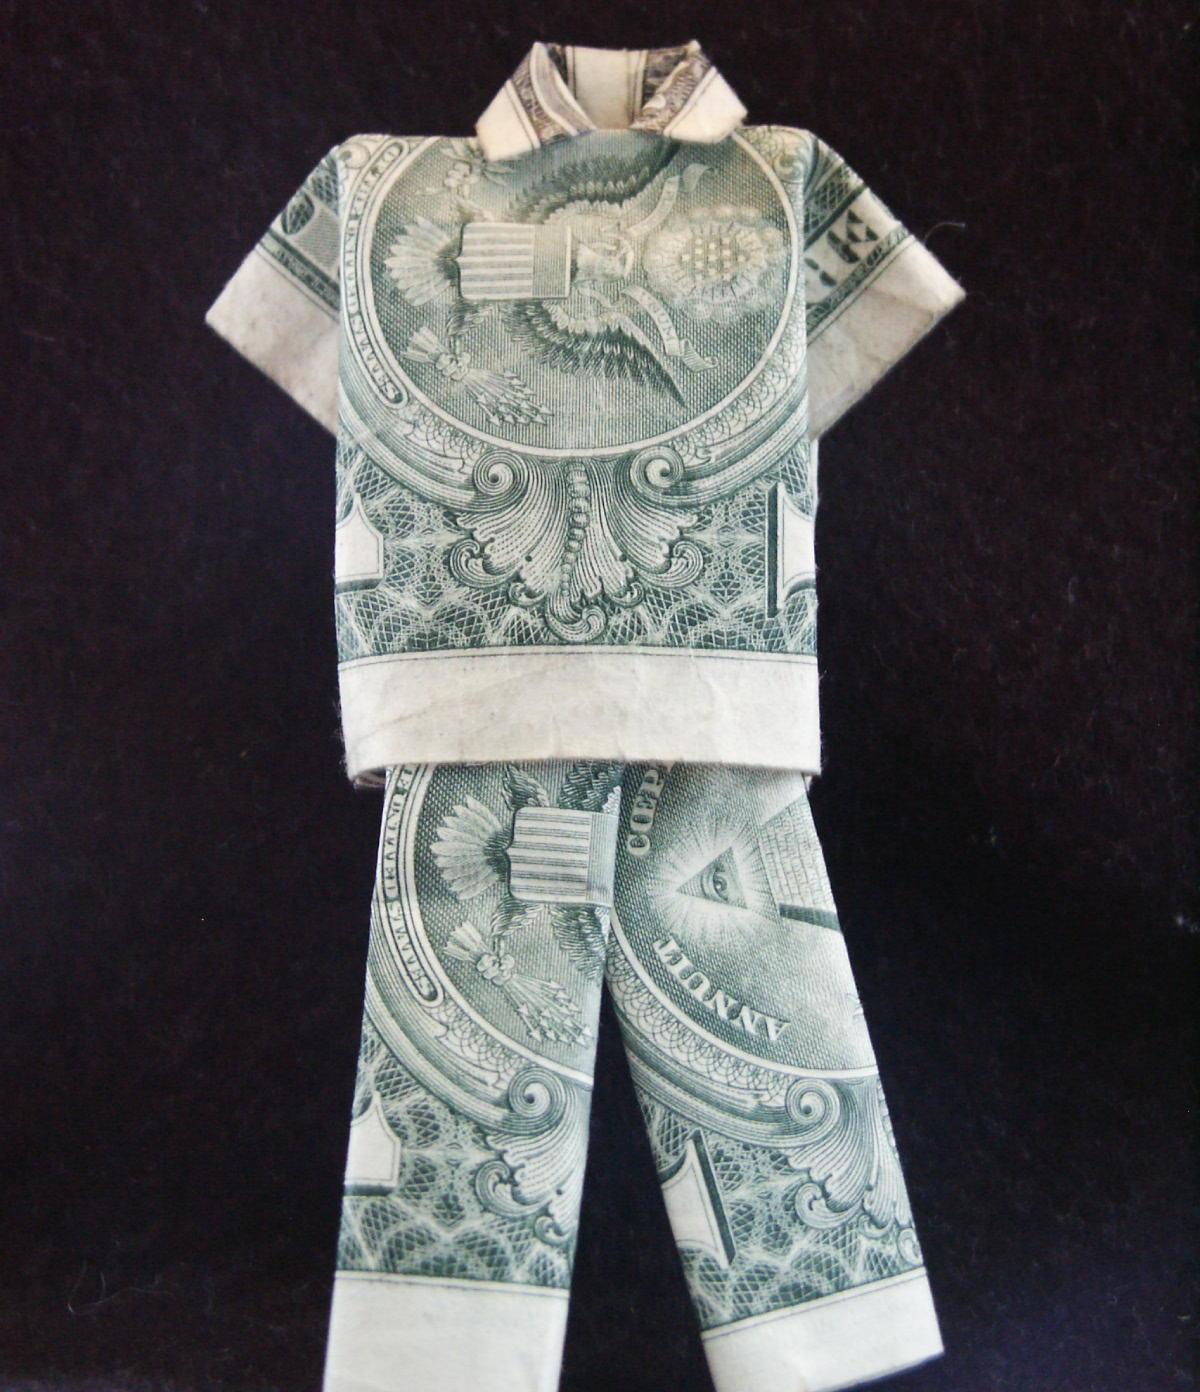 Money Folding Pictures | Wallpaperholic - photo#46